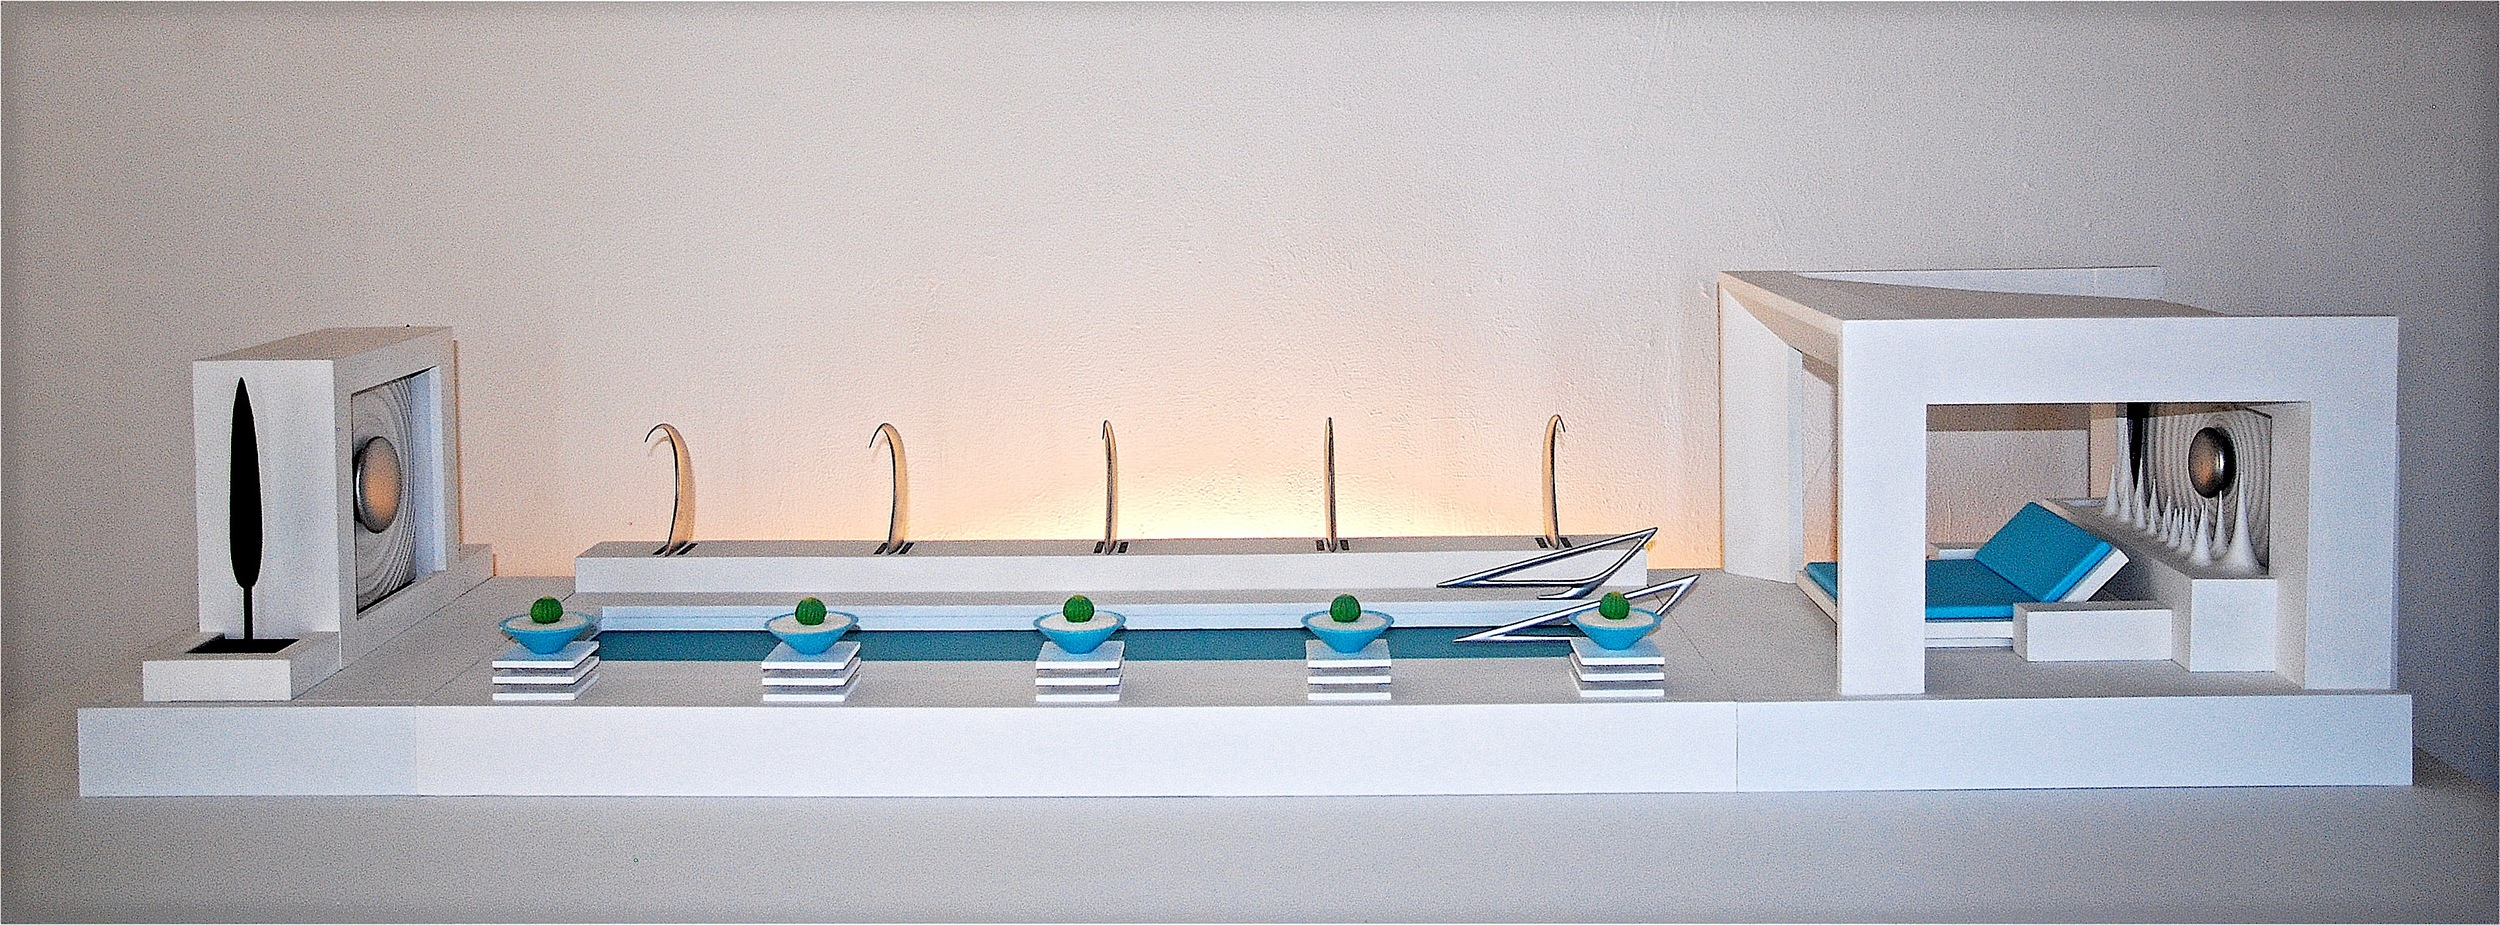 Thomas Coffin - custom pool, cabana, and fountain design model